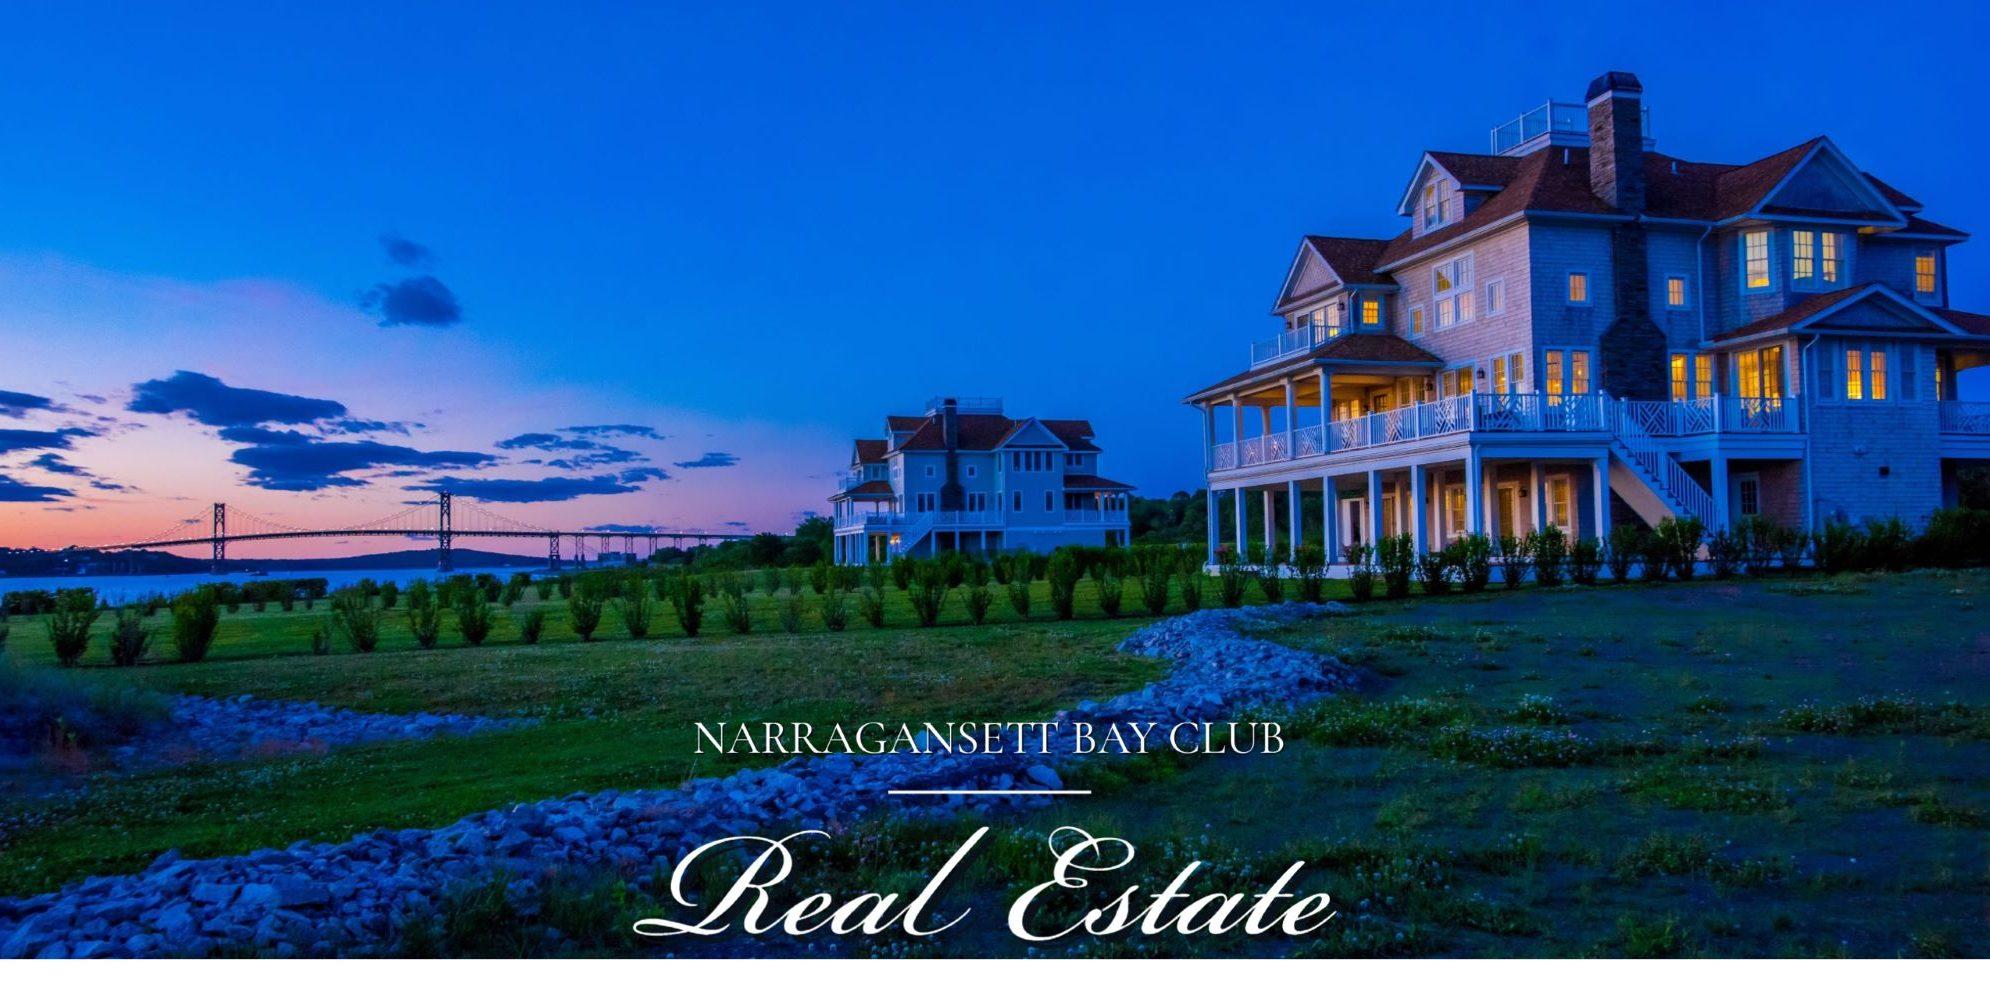 Narragansett Bay Club